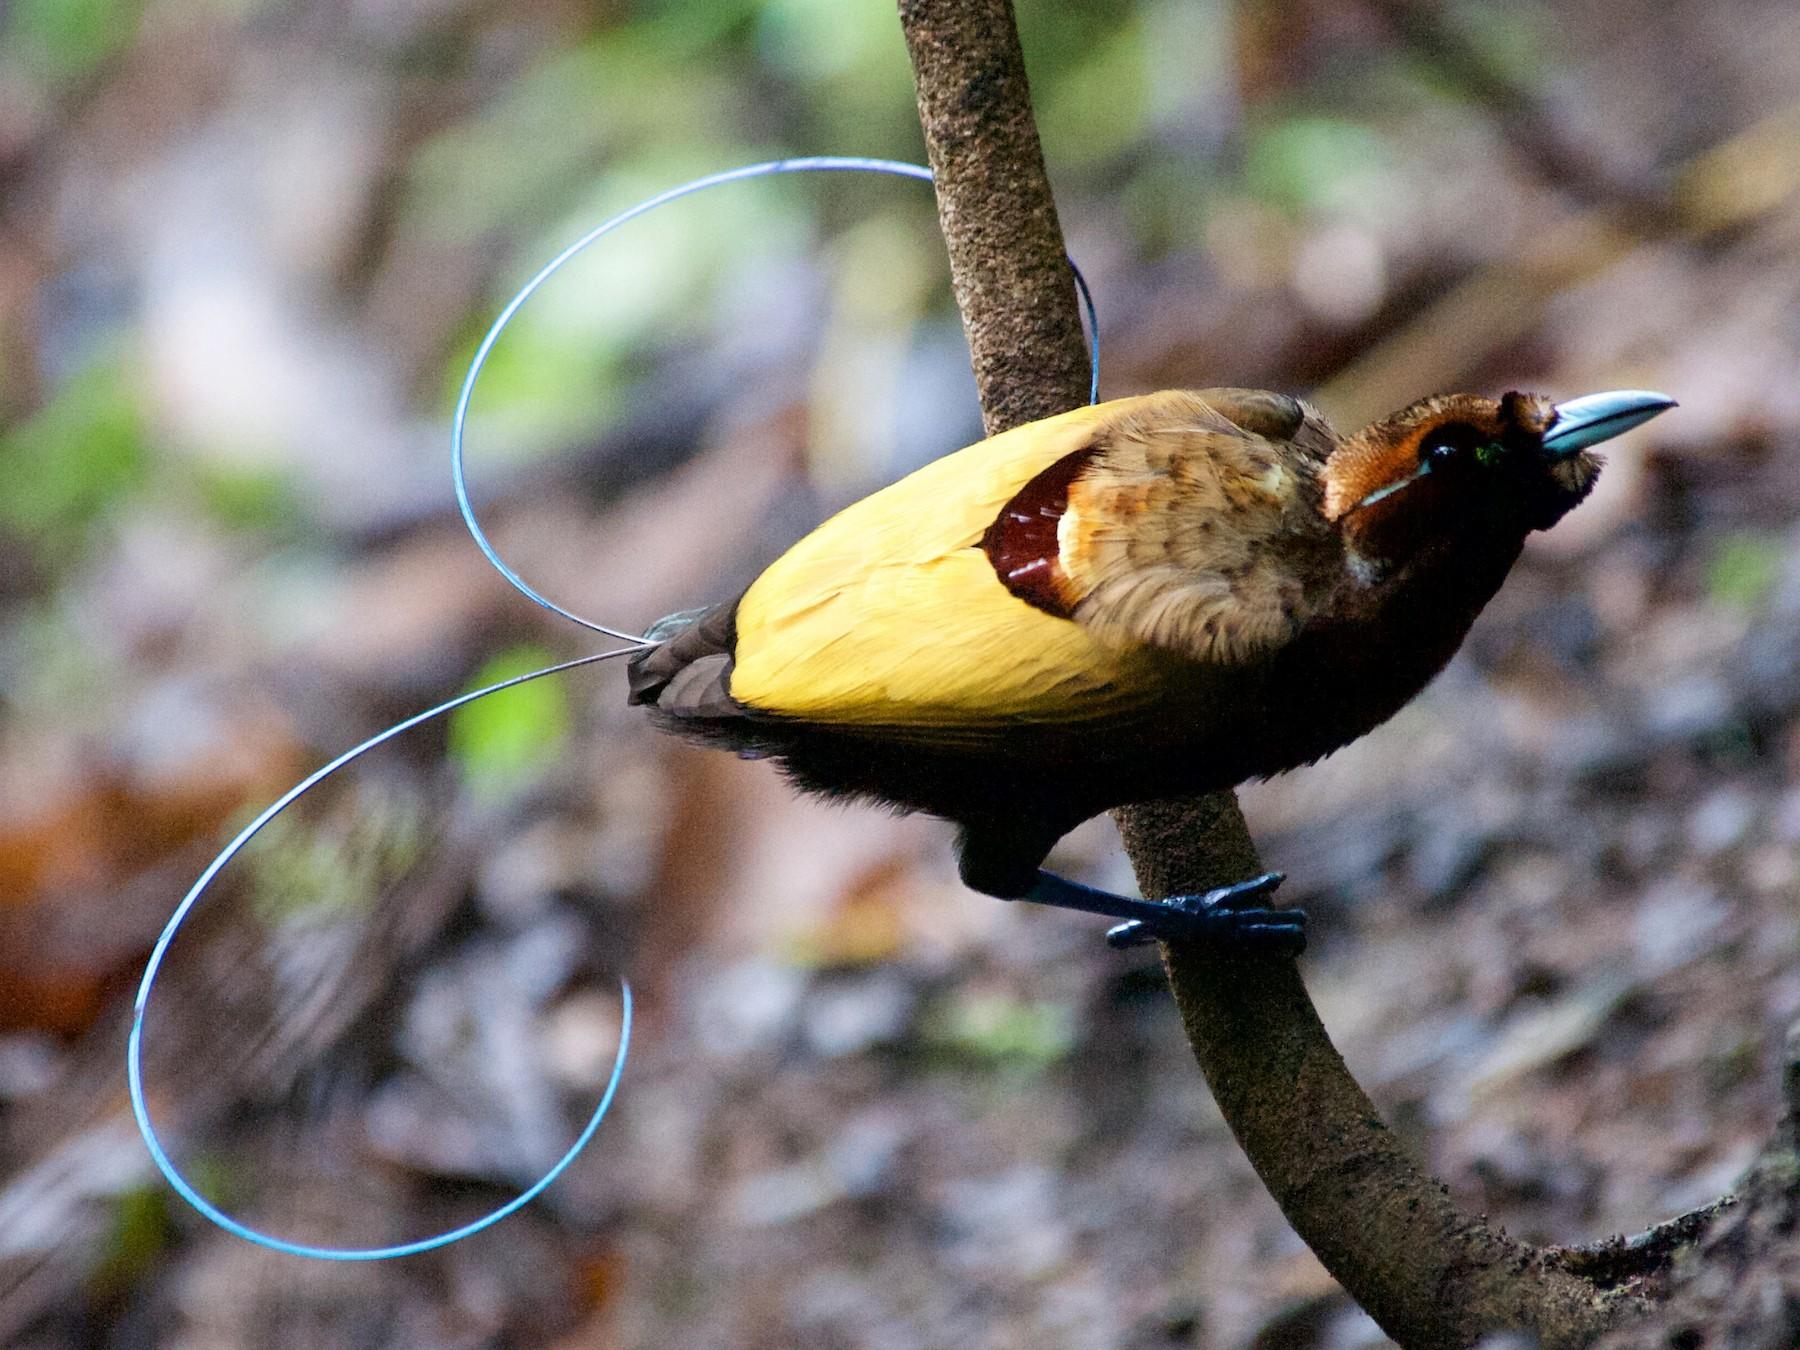 Magnificent Bird-of-Paradise - John C. Mittermeier